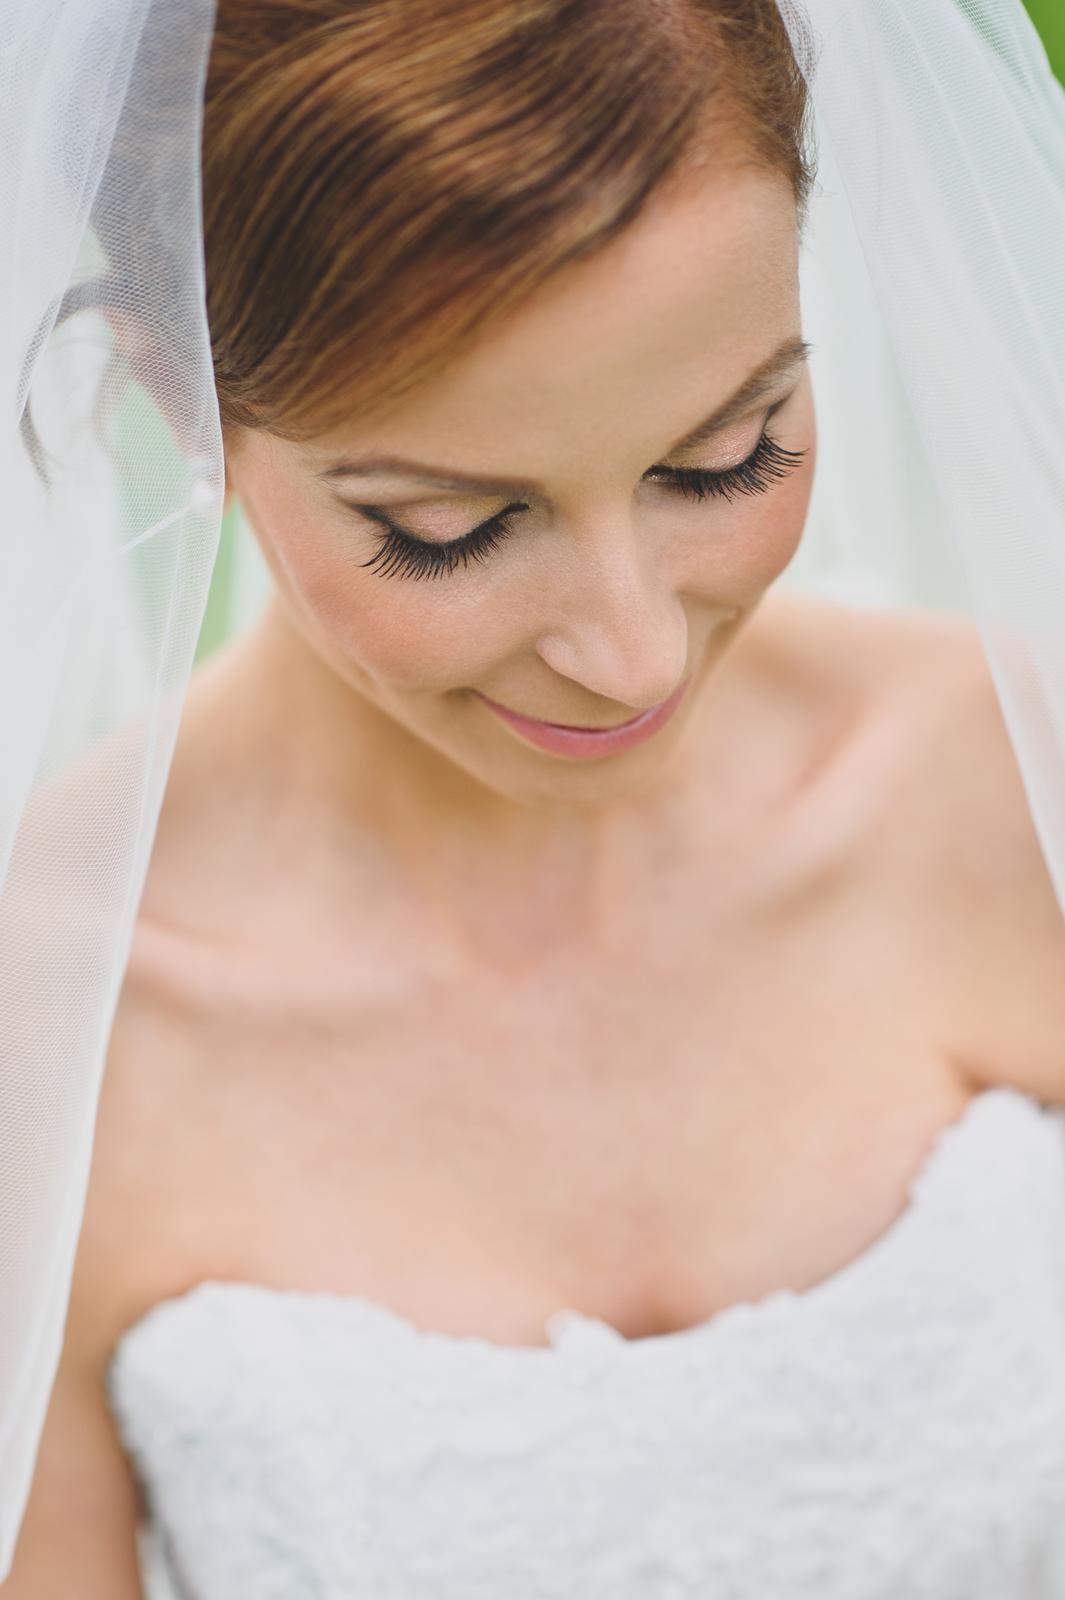 Boris Bordács make-up & hairstyle - svadobné líčenie a účes - photo: frantisek petko, mua/hair: boris bordacs